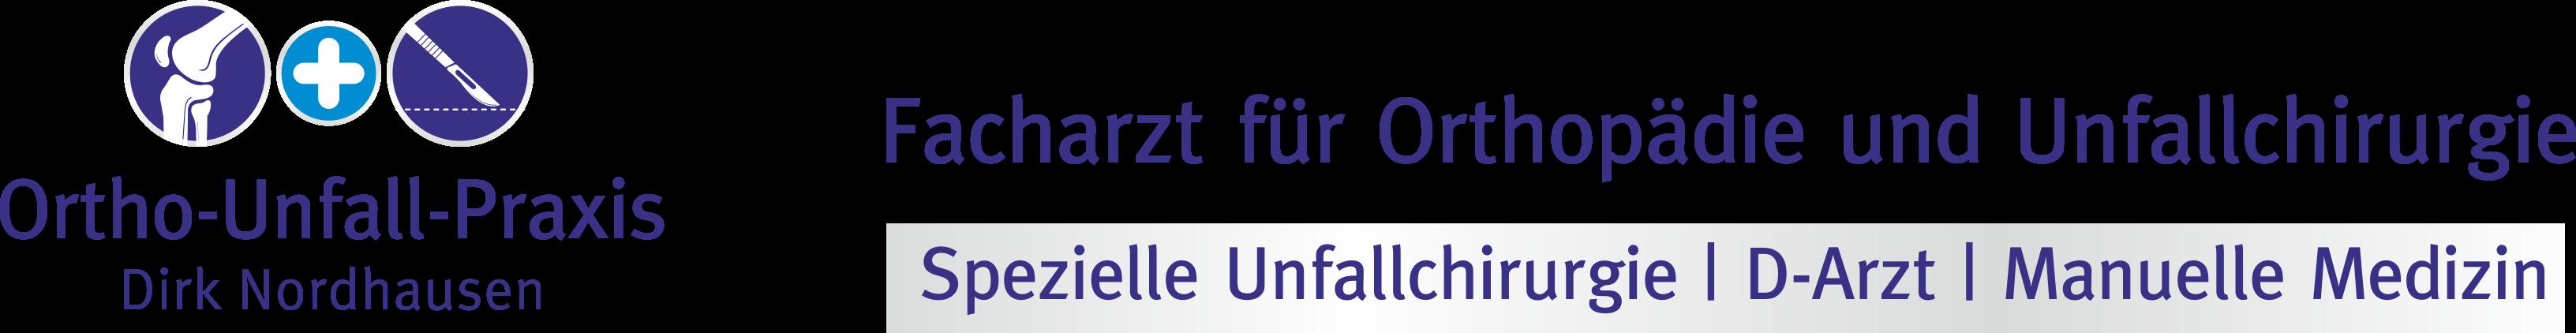 Ortho-Unfall-Praxis Dirk Nordhausen